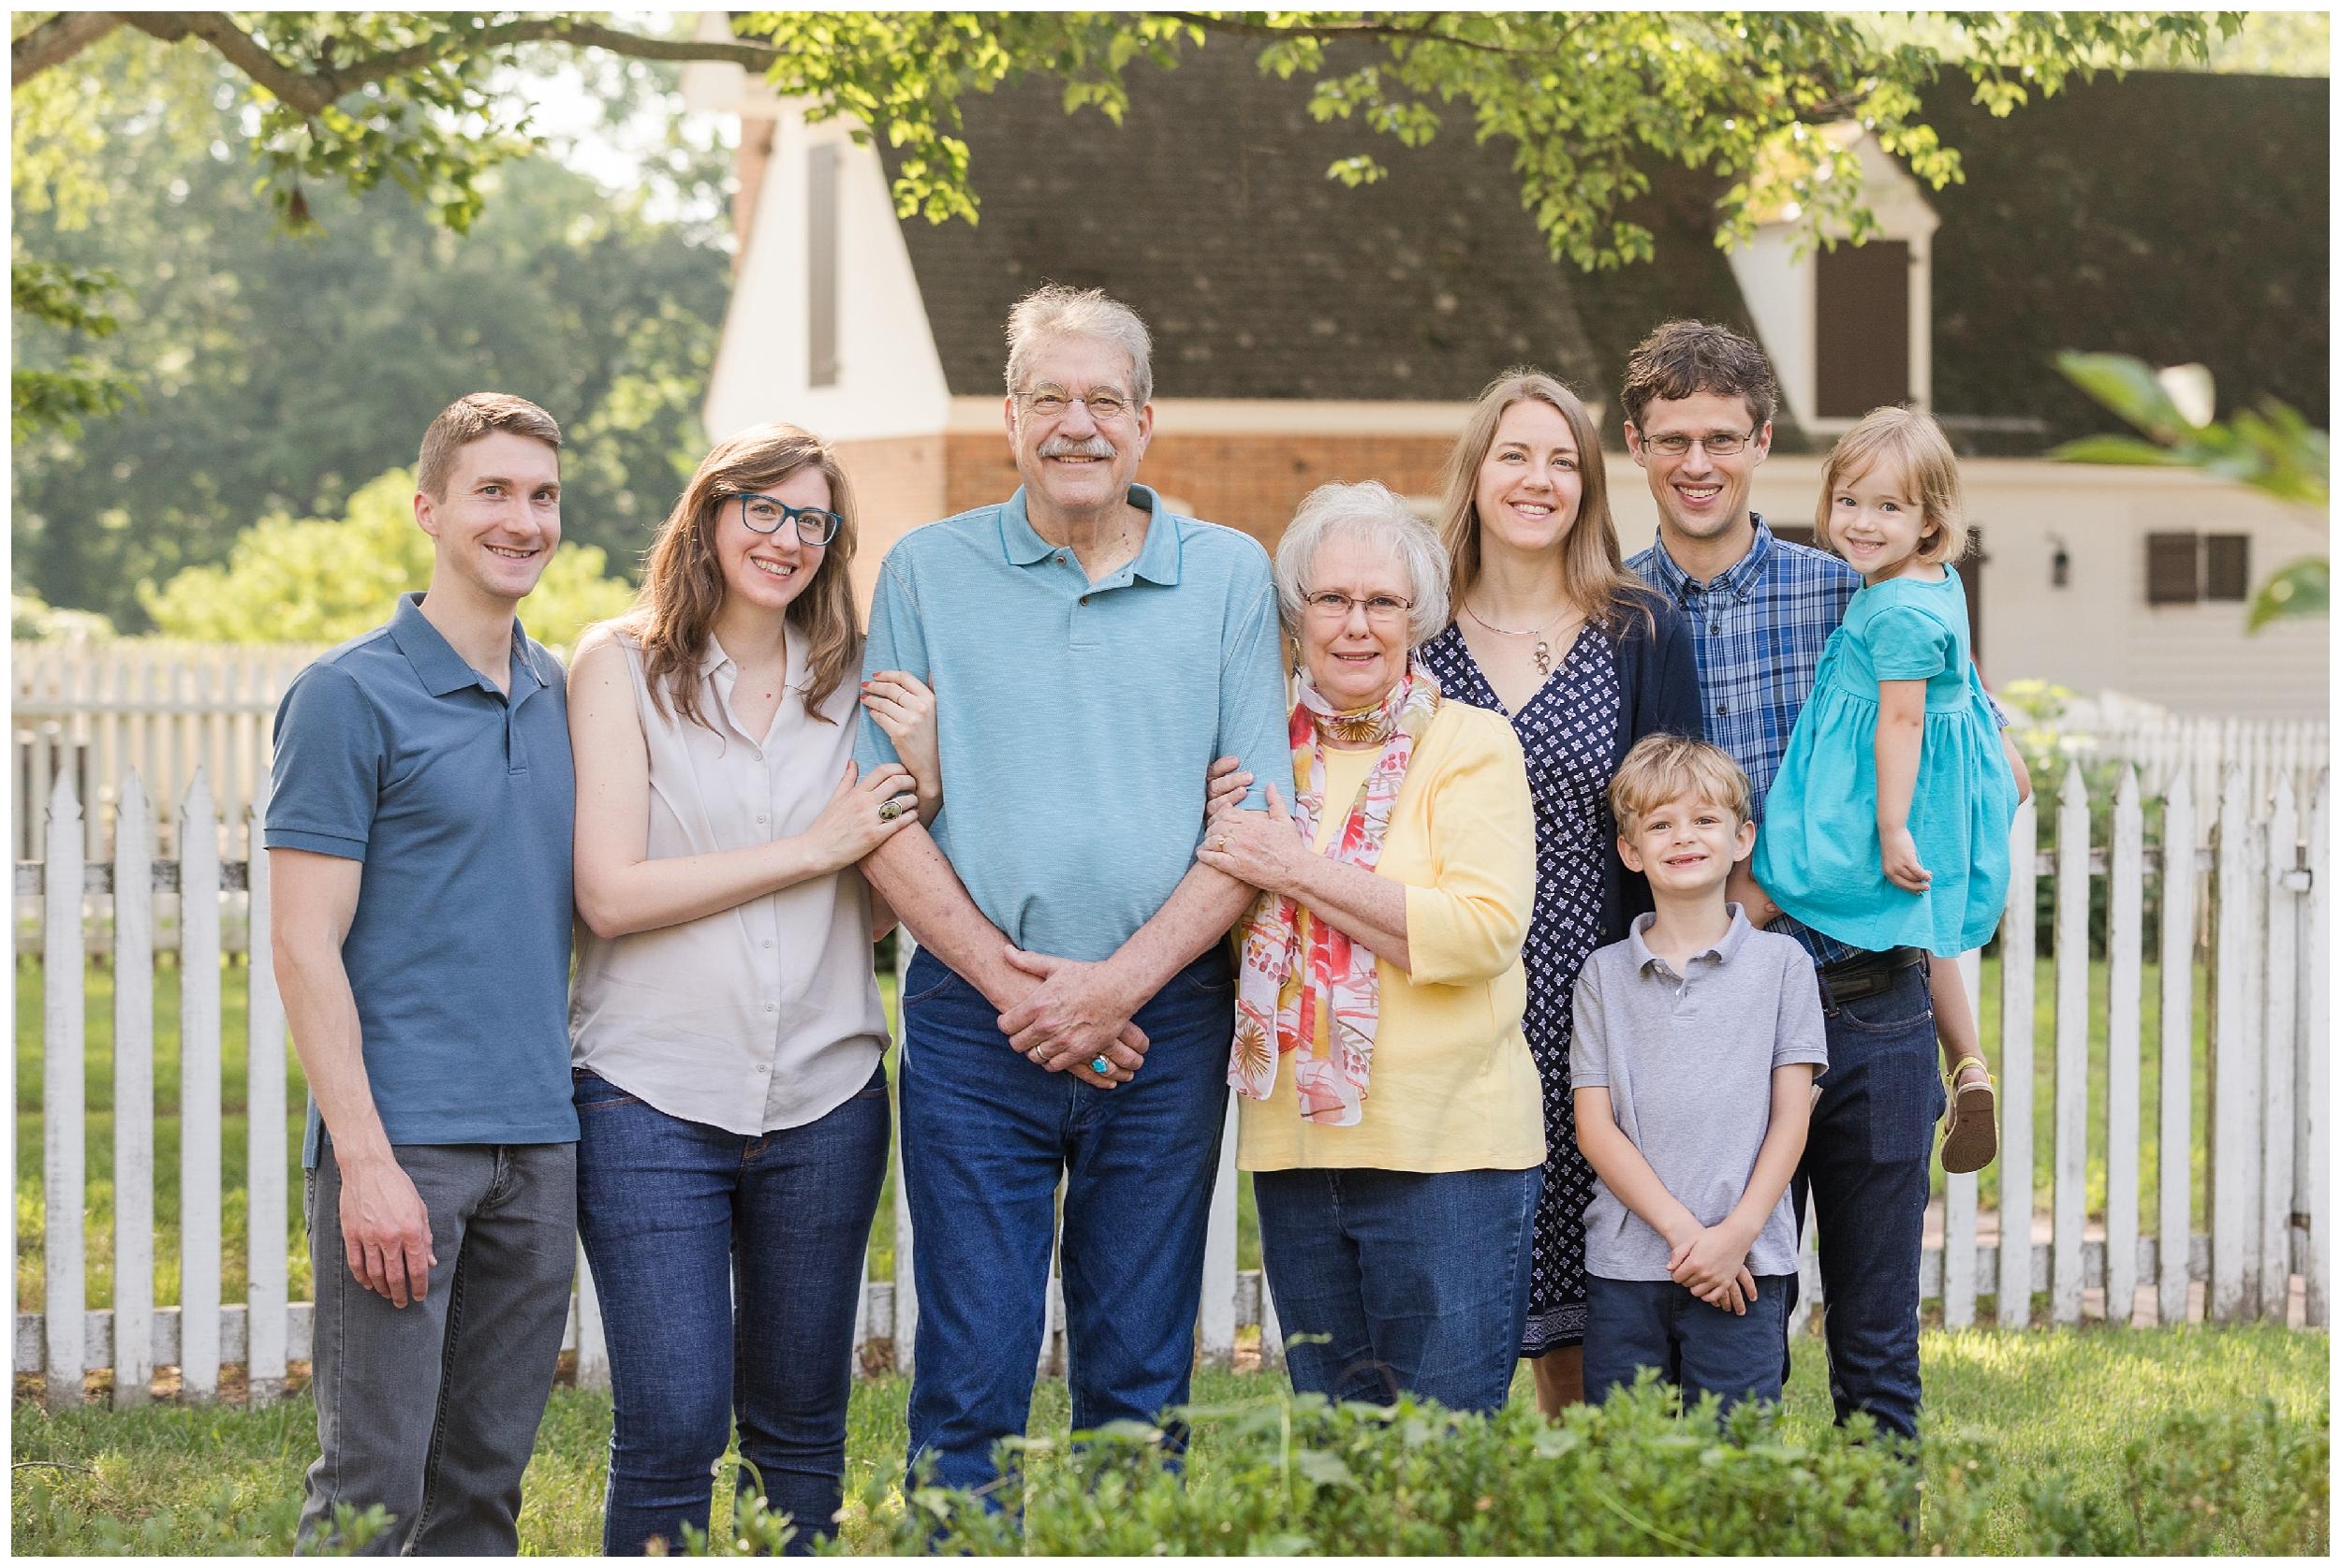 williamsburg family photography by elovephotos_0000.jpg